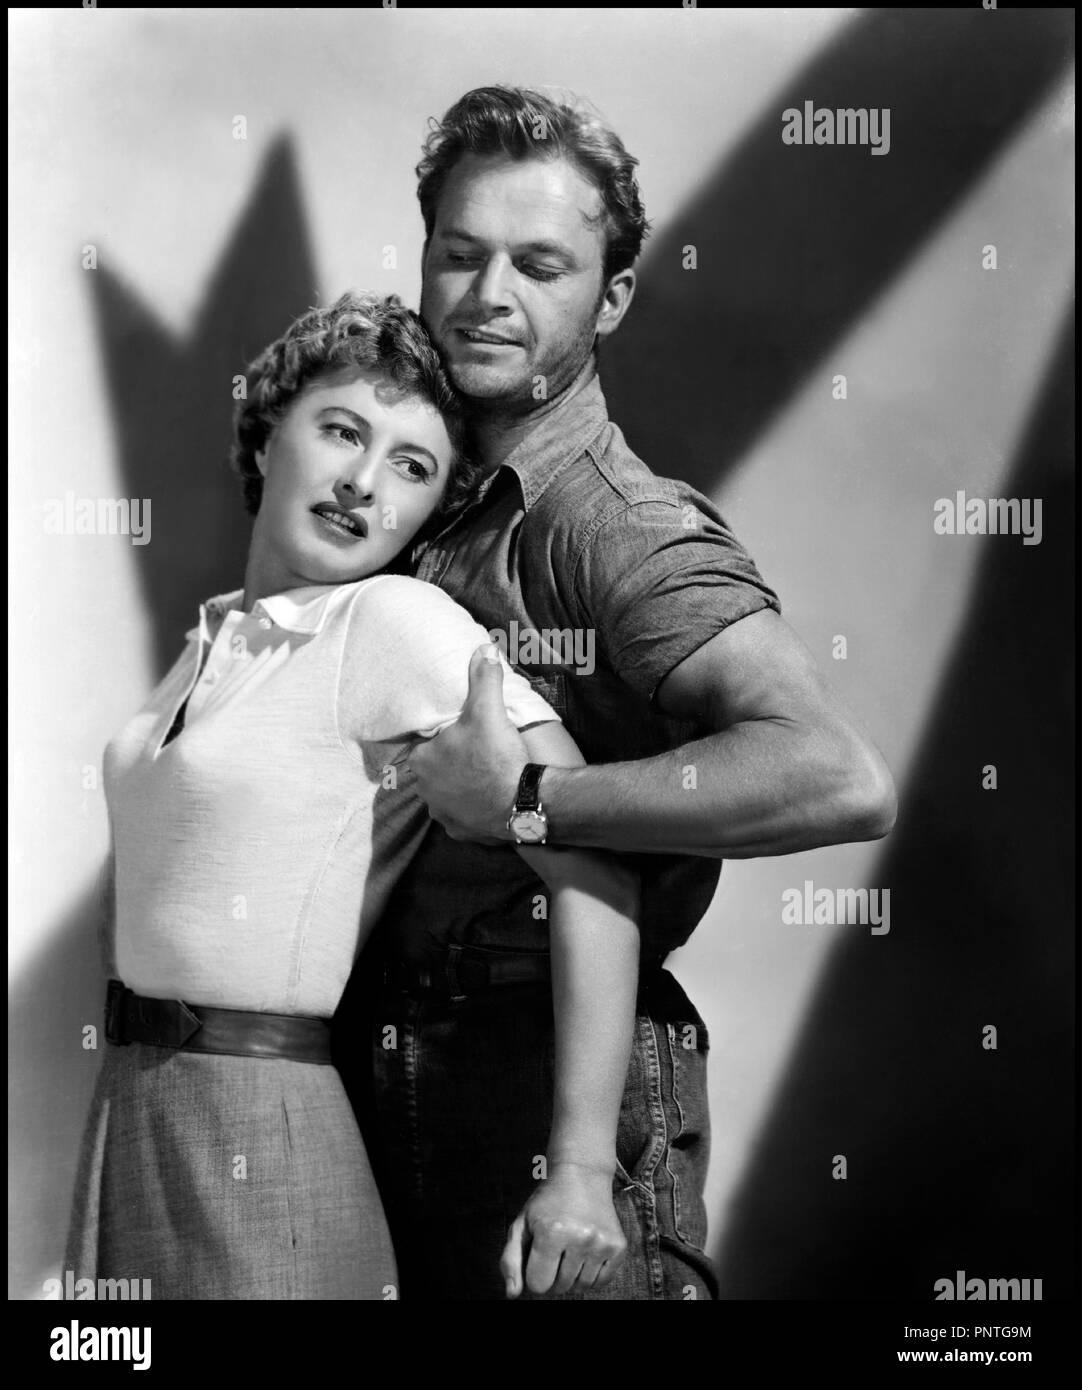 Prod DB © Loew's Inc. - Metro-Goldwyn-Mayer / DR LA PLAGE DESERTE (JEOPARDY) de John Sturges 1953 USA avec Barbara Stanwyck et Ralph Meeker  couple, pose, viol, femme battue, ombres, ambiance, film noir code MGM: 1594 - Stock Image